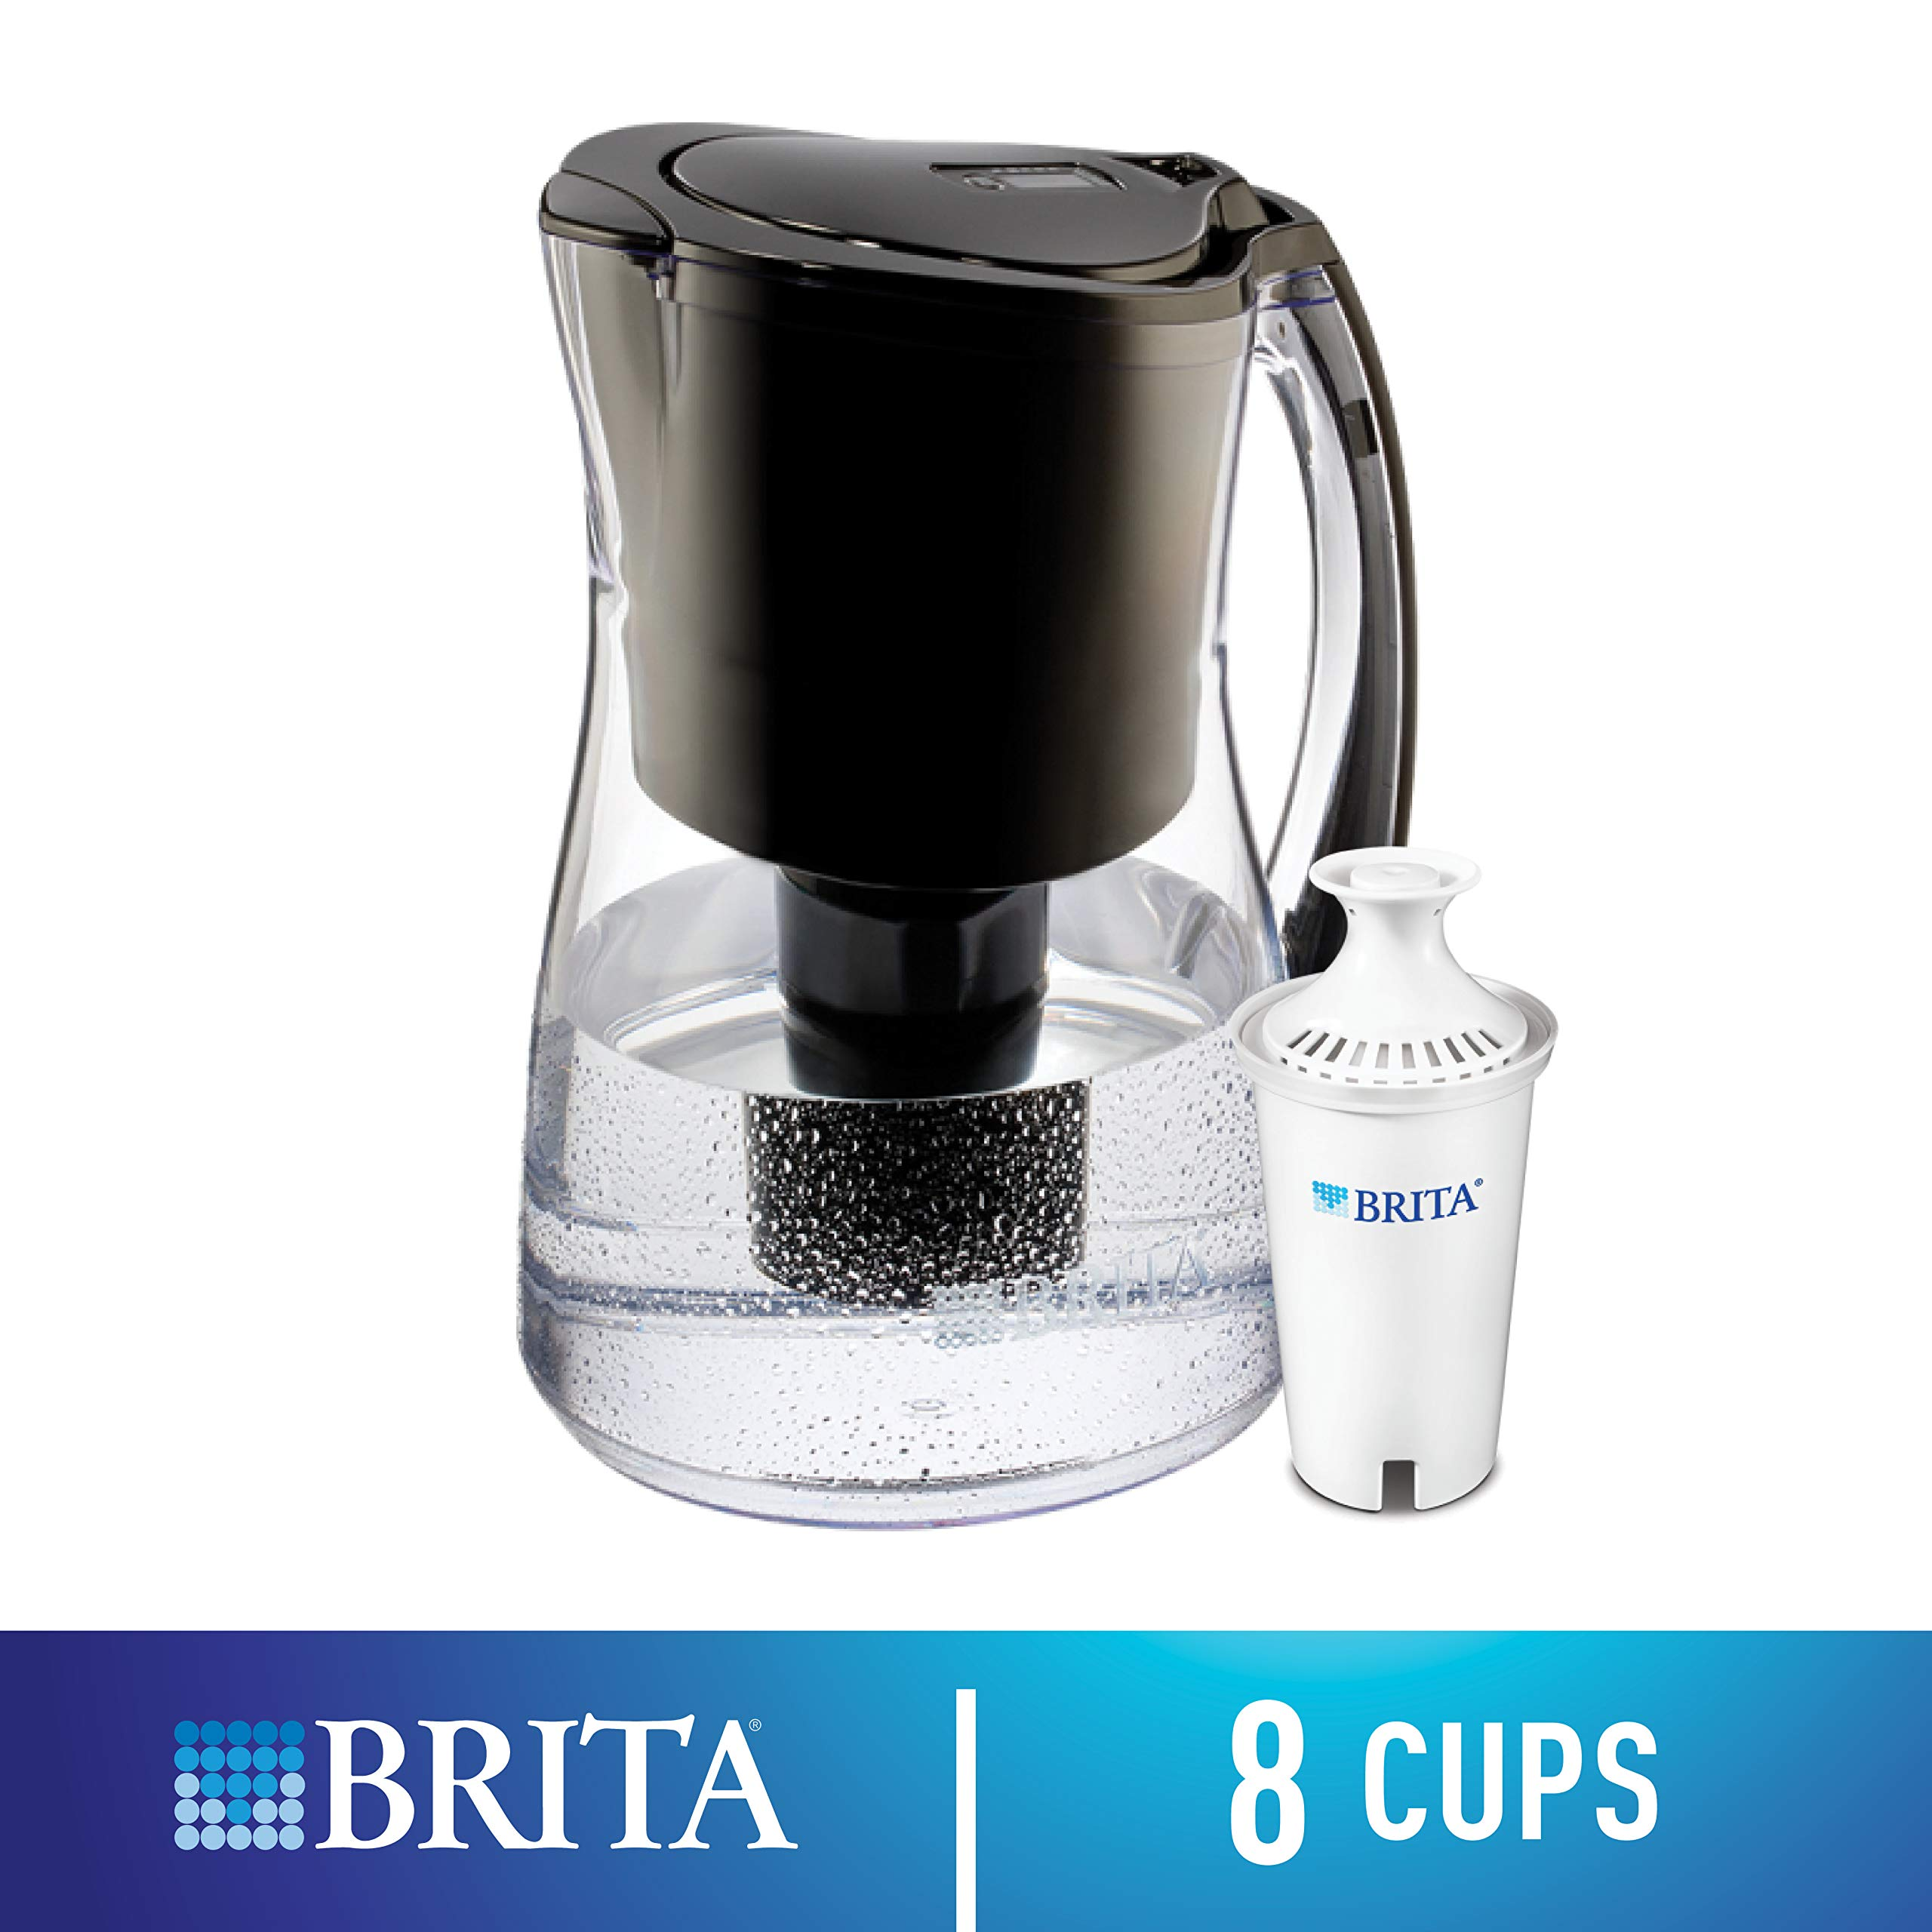 Brita Medium 8 Cup Water Filter Pitcher with 1 Standard Filter, BPA Free - Marina, Black by Brita (Image #1)